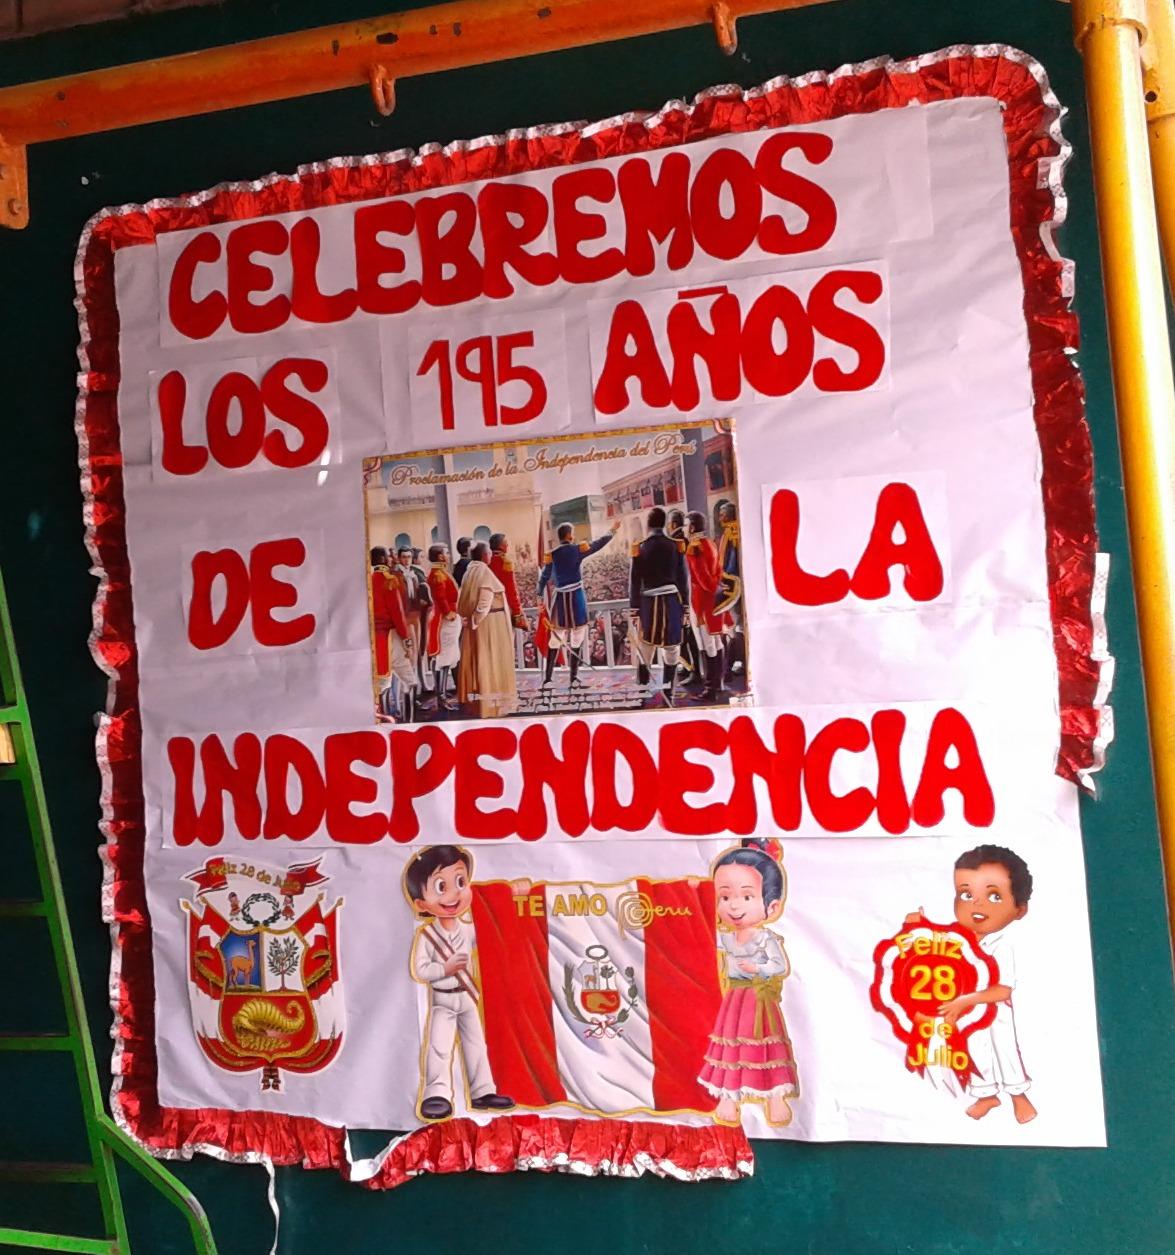 Imagenes de periodico mural slideshare for Diario mural fiestas patrias chile